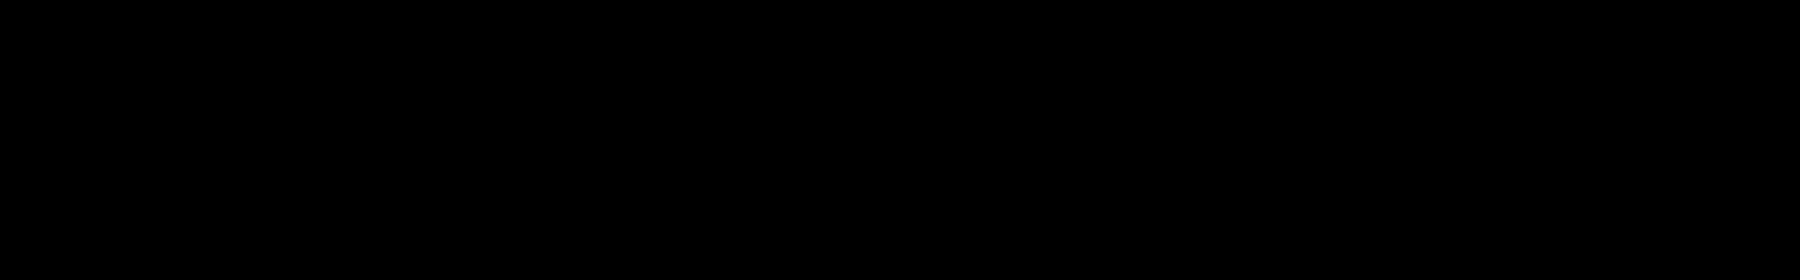 Kate Wild - Vocal Hooks audio waveform